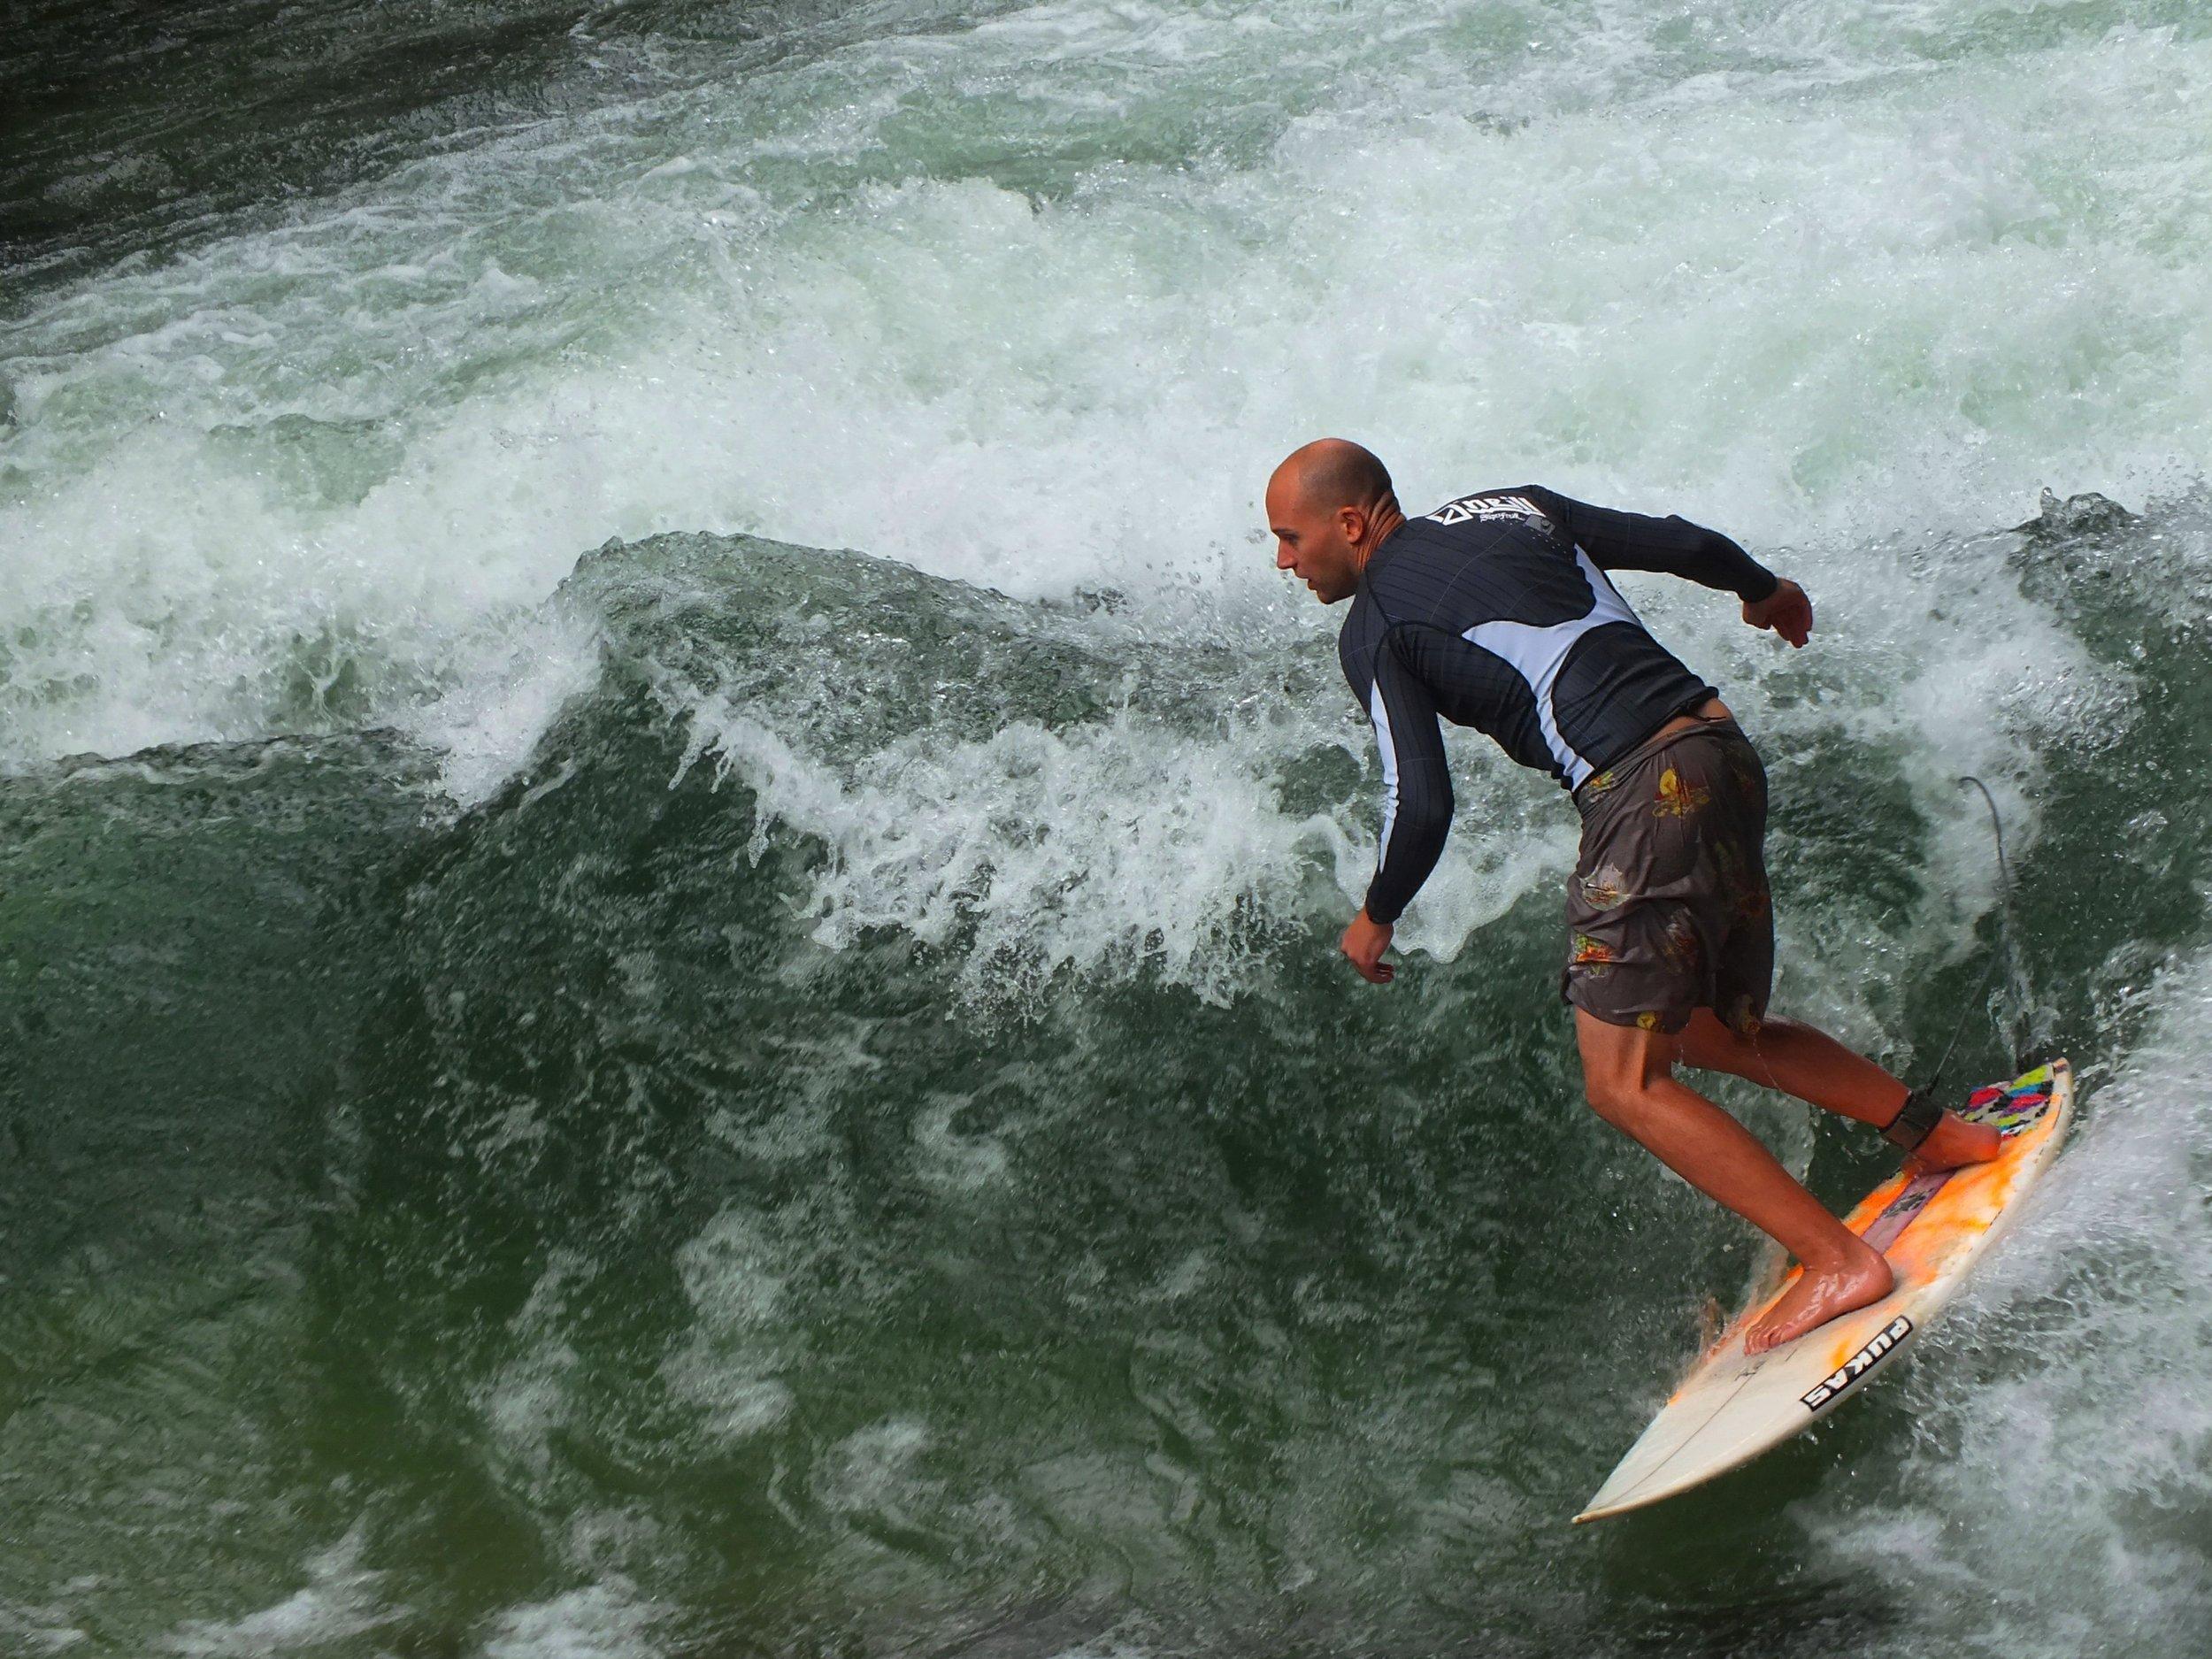 surfing munich, germany